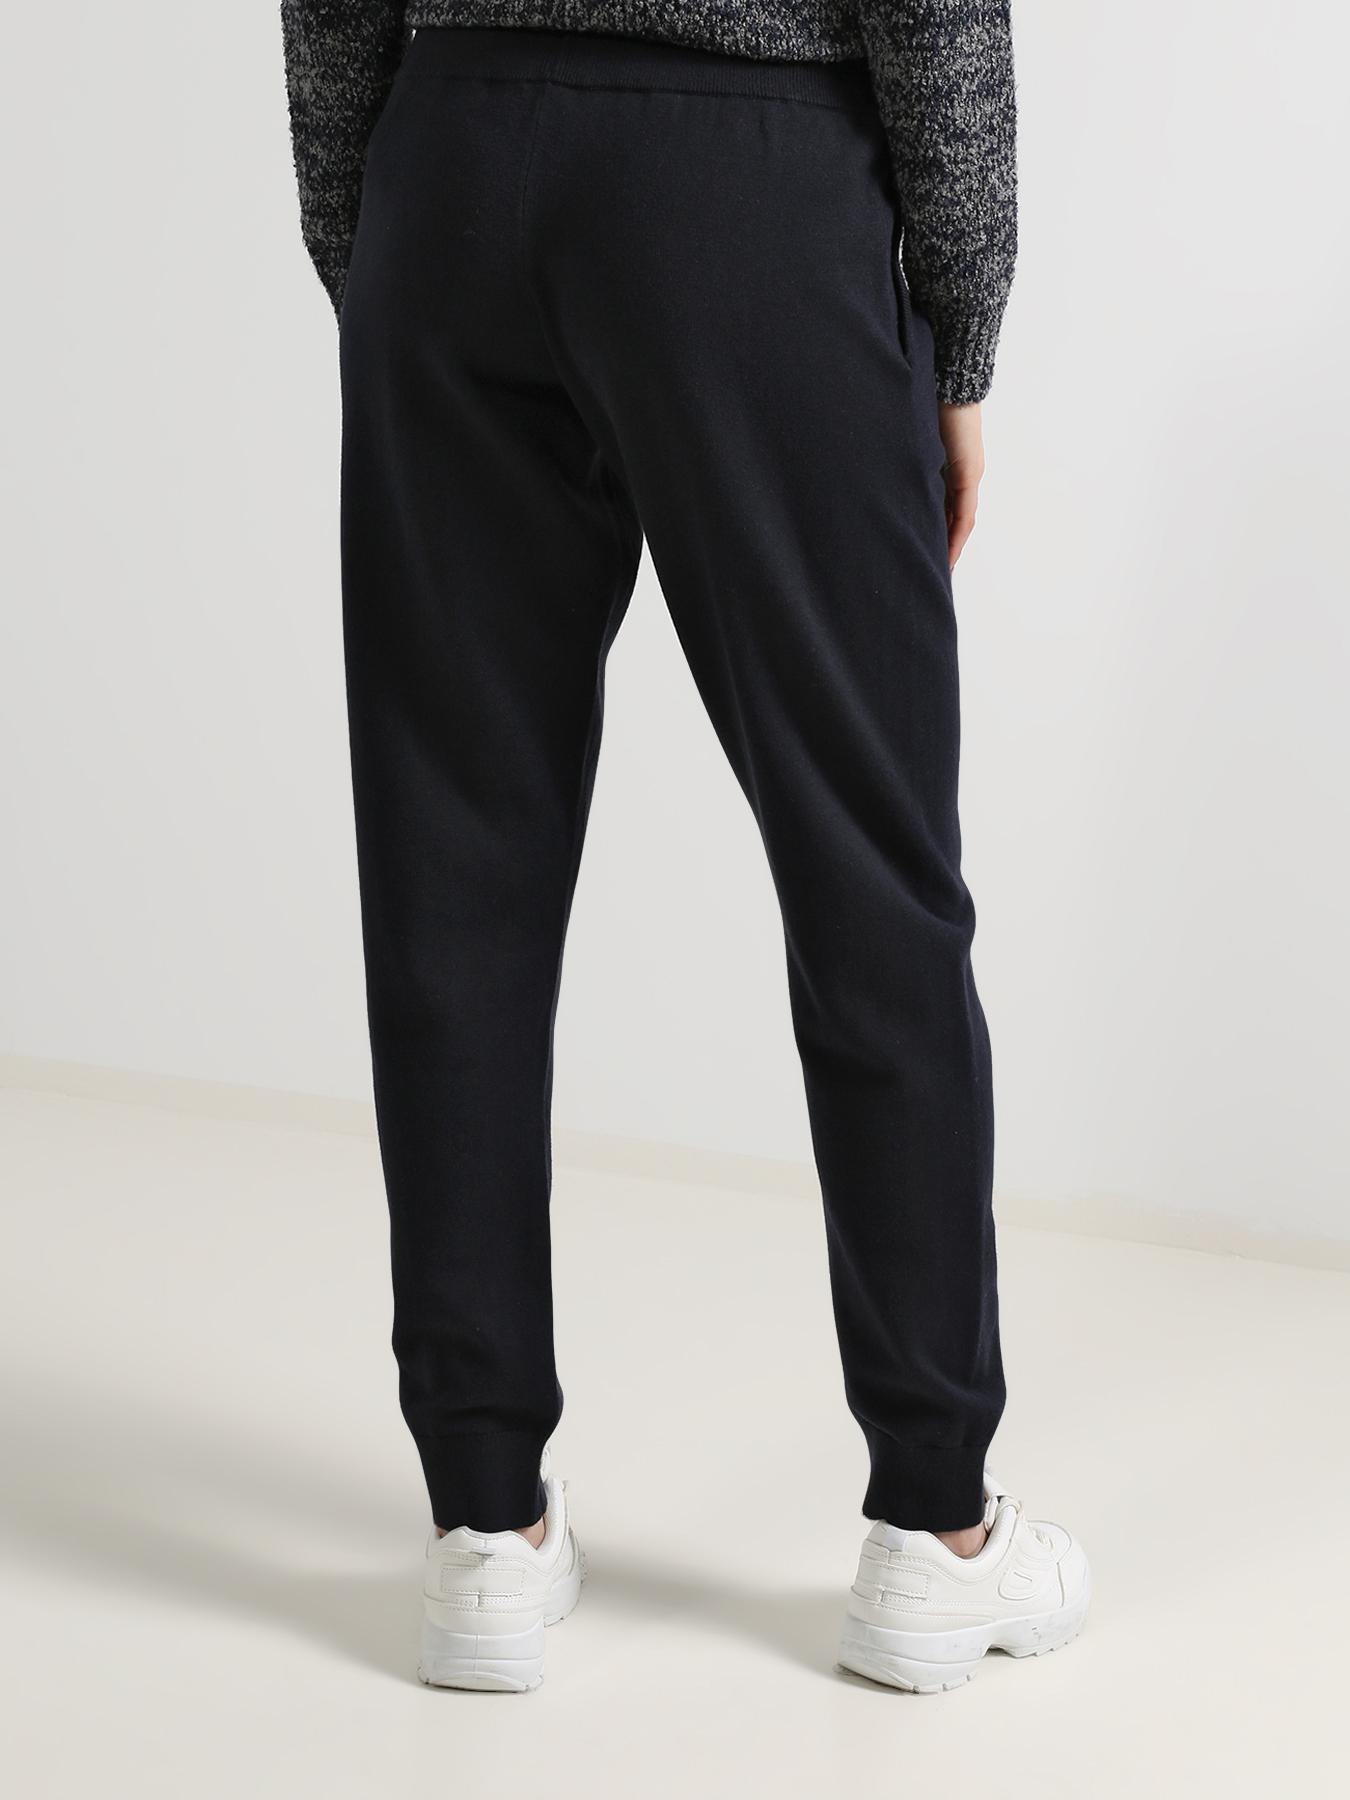 BOSS Спортивные брюки Ijogging 357196-042 Фото 2